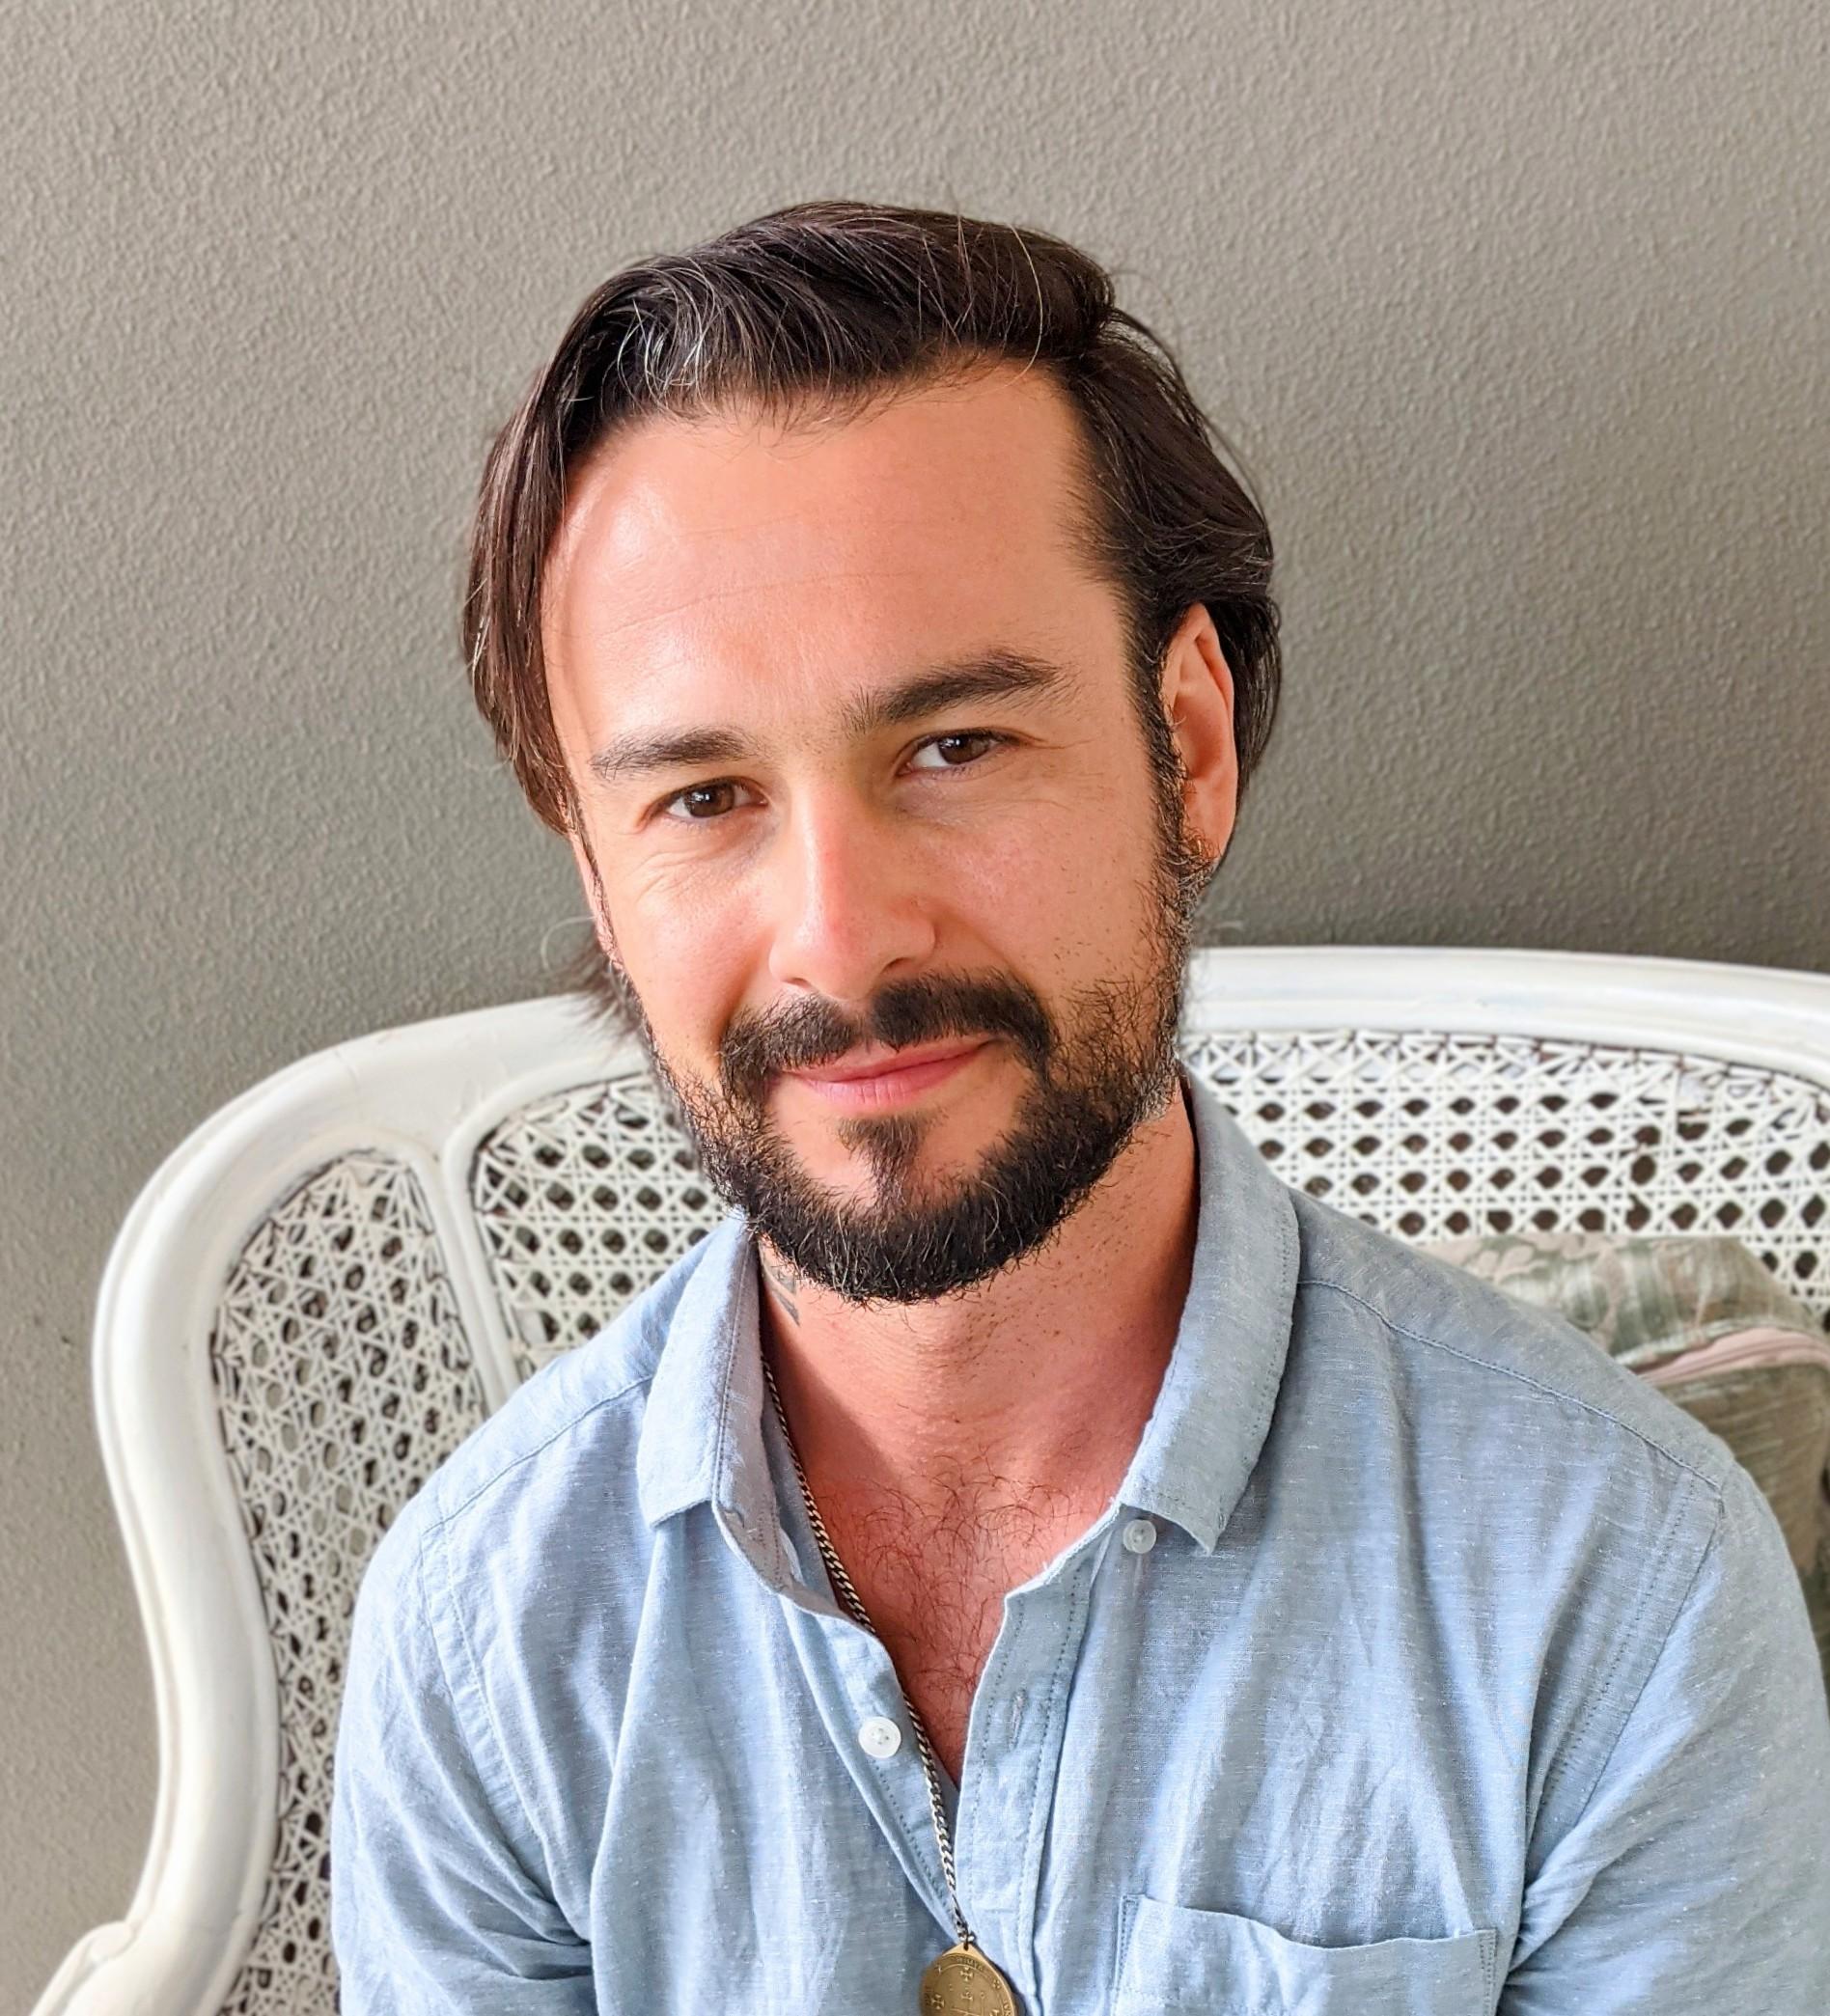 Ryan Findlay